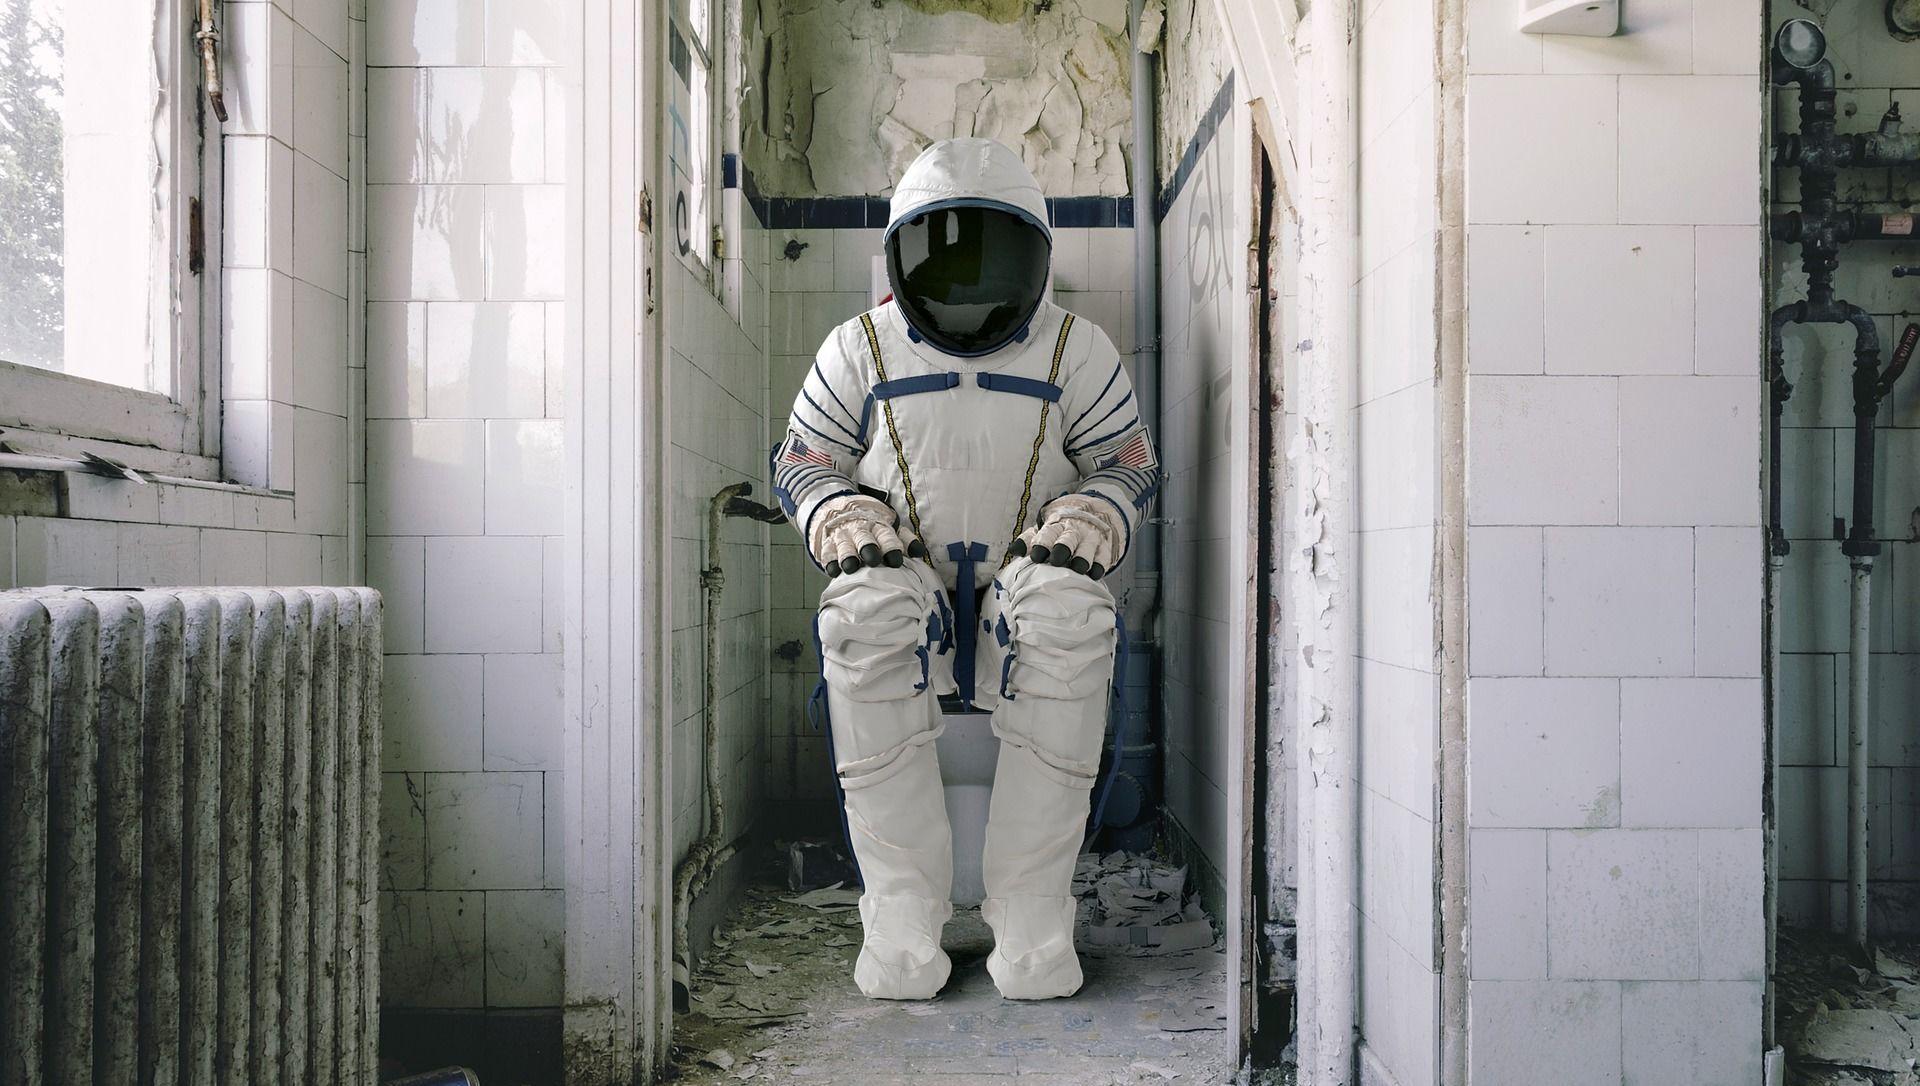 Astronauta seduto su WC - Sputnik Italia, 1920, 12.04.2021